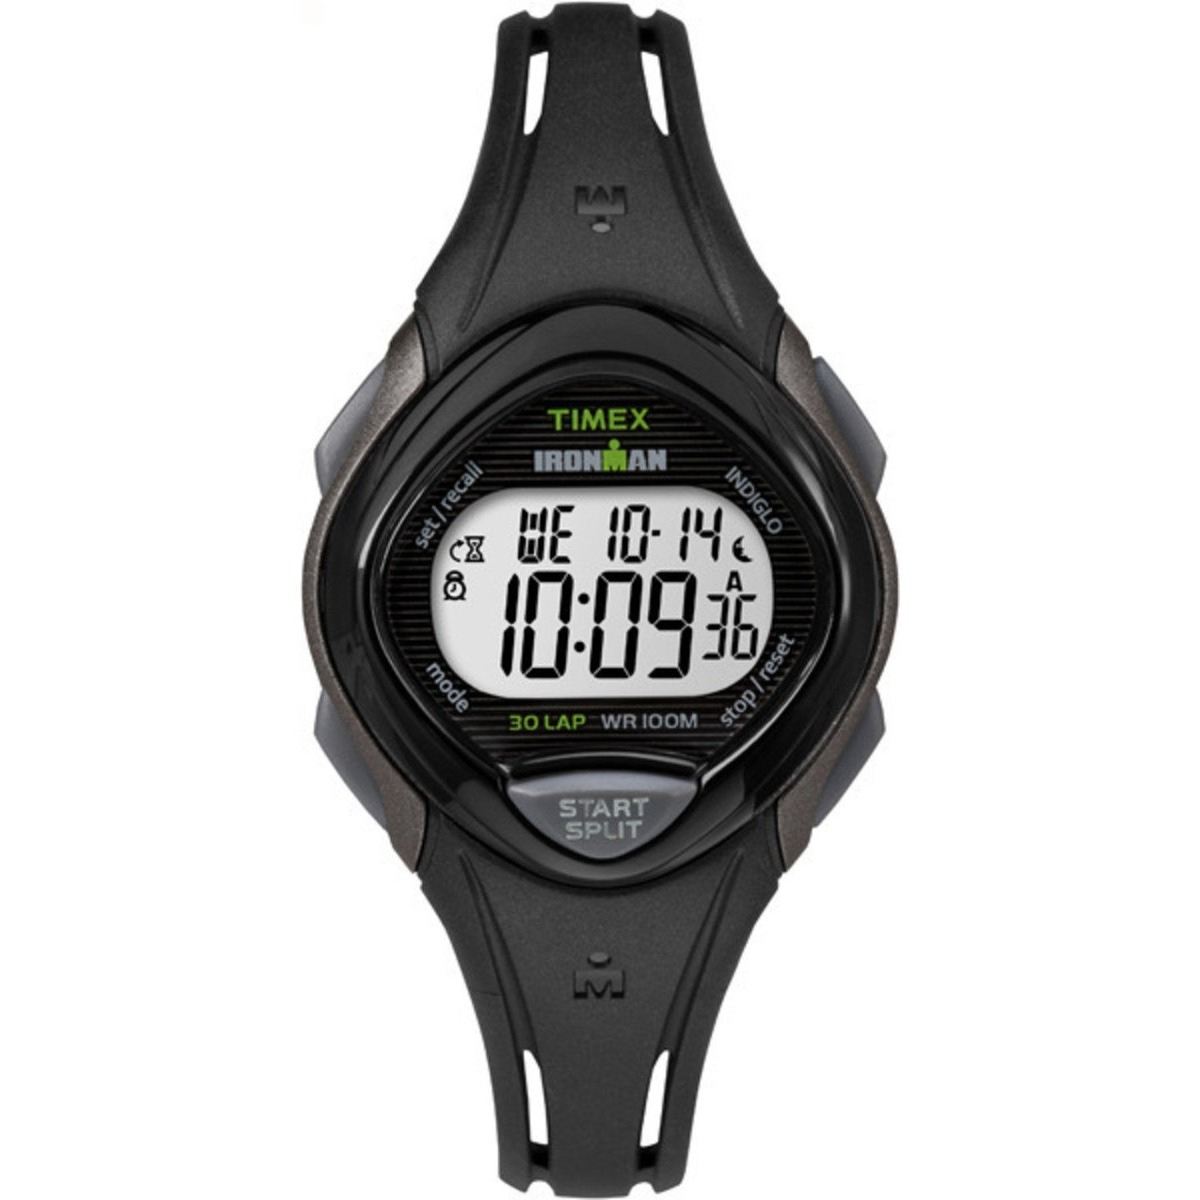 3d4940a6cf06 reloj timex ironman sleek 30 lap mid-size tw5m10300 black. Cargando zoom.